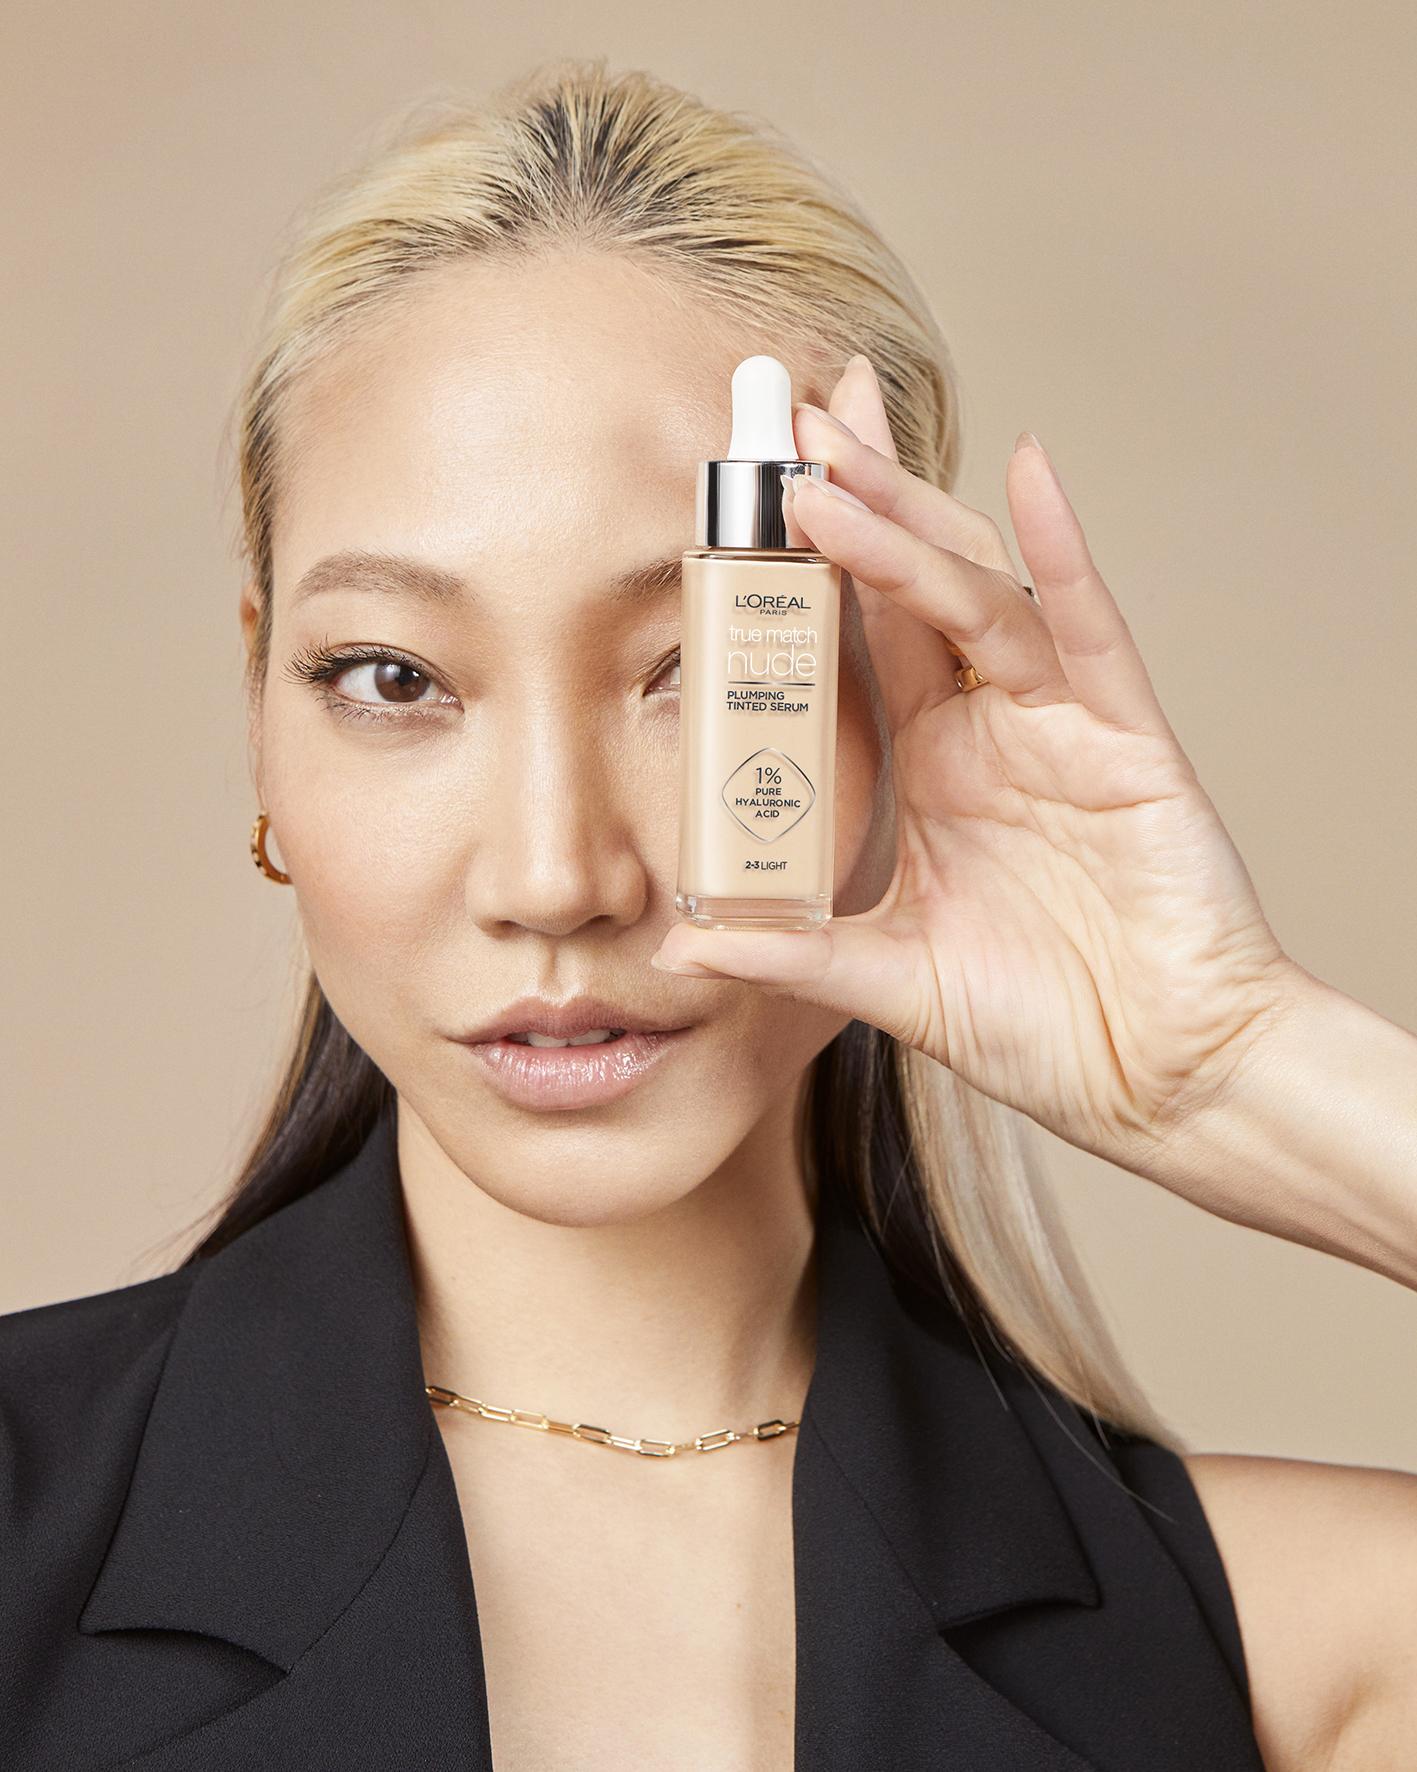 True Match Nude Plumping Tinted Serum L'Oréal Paris